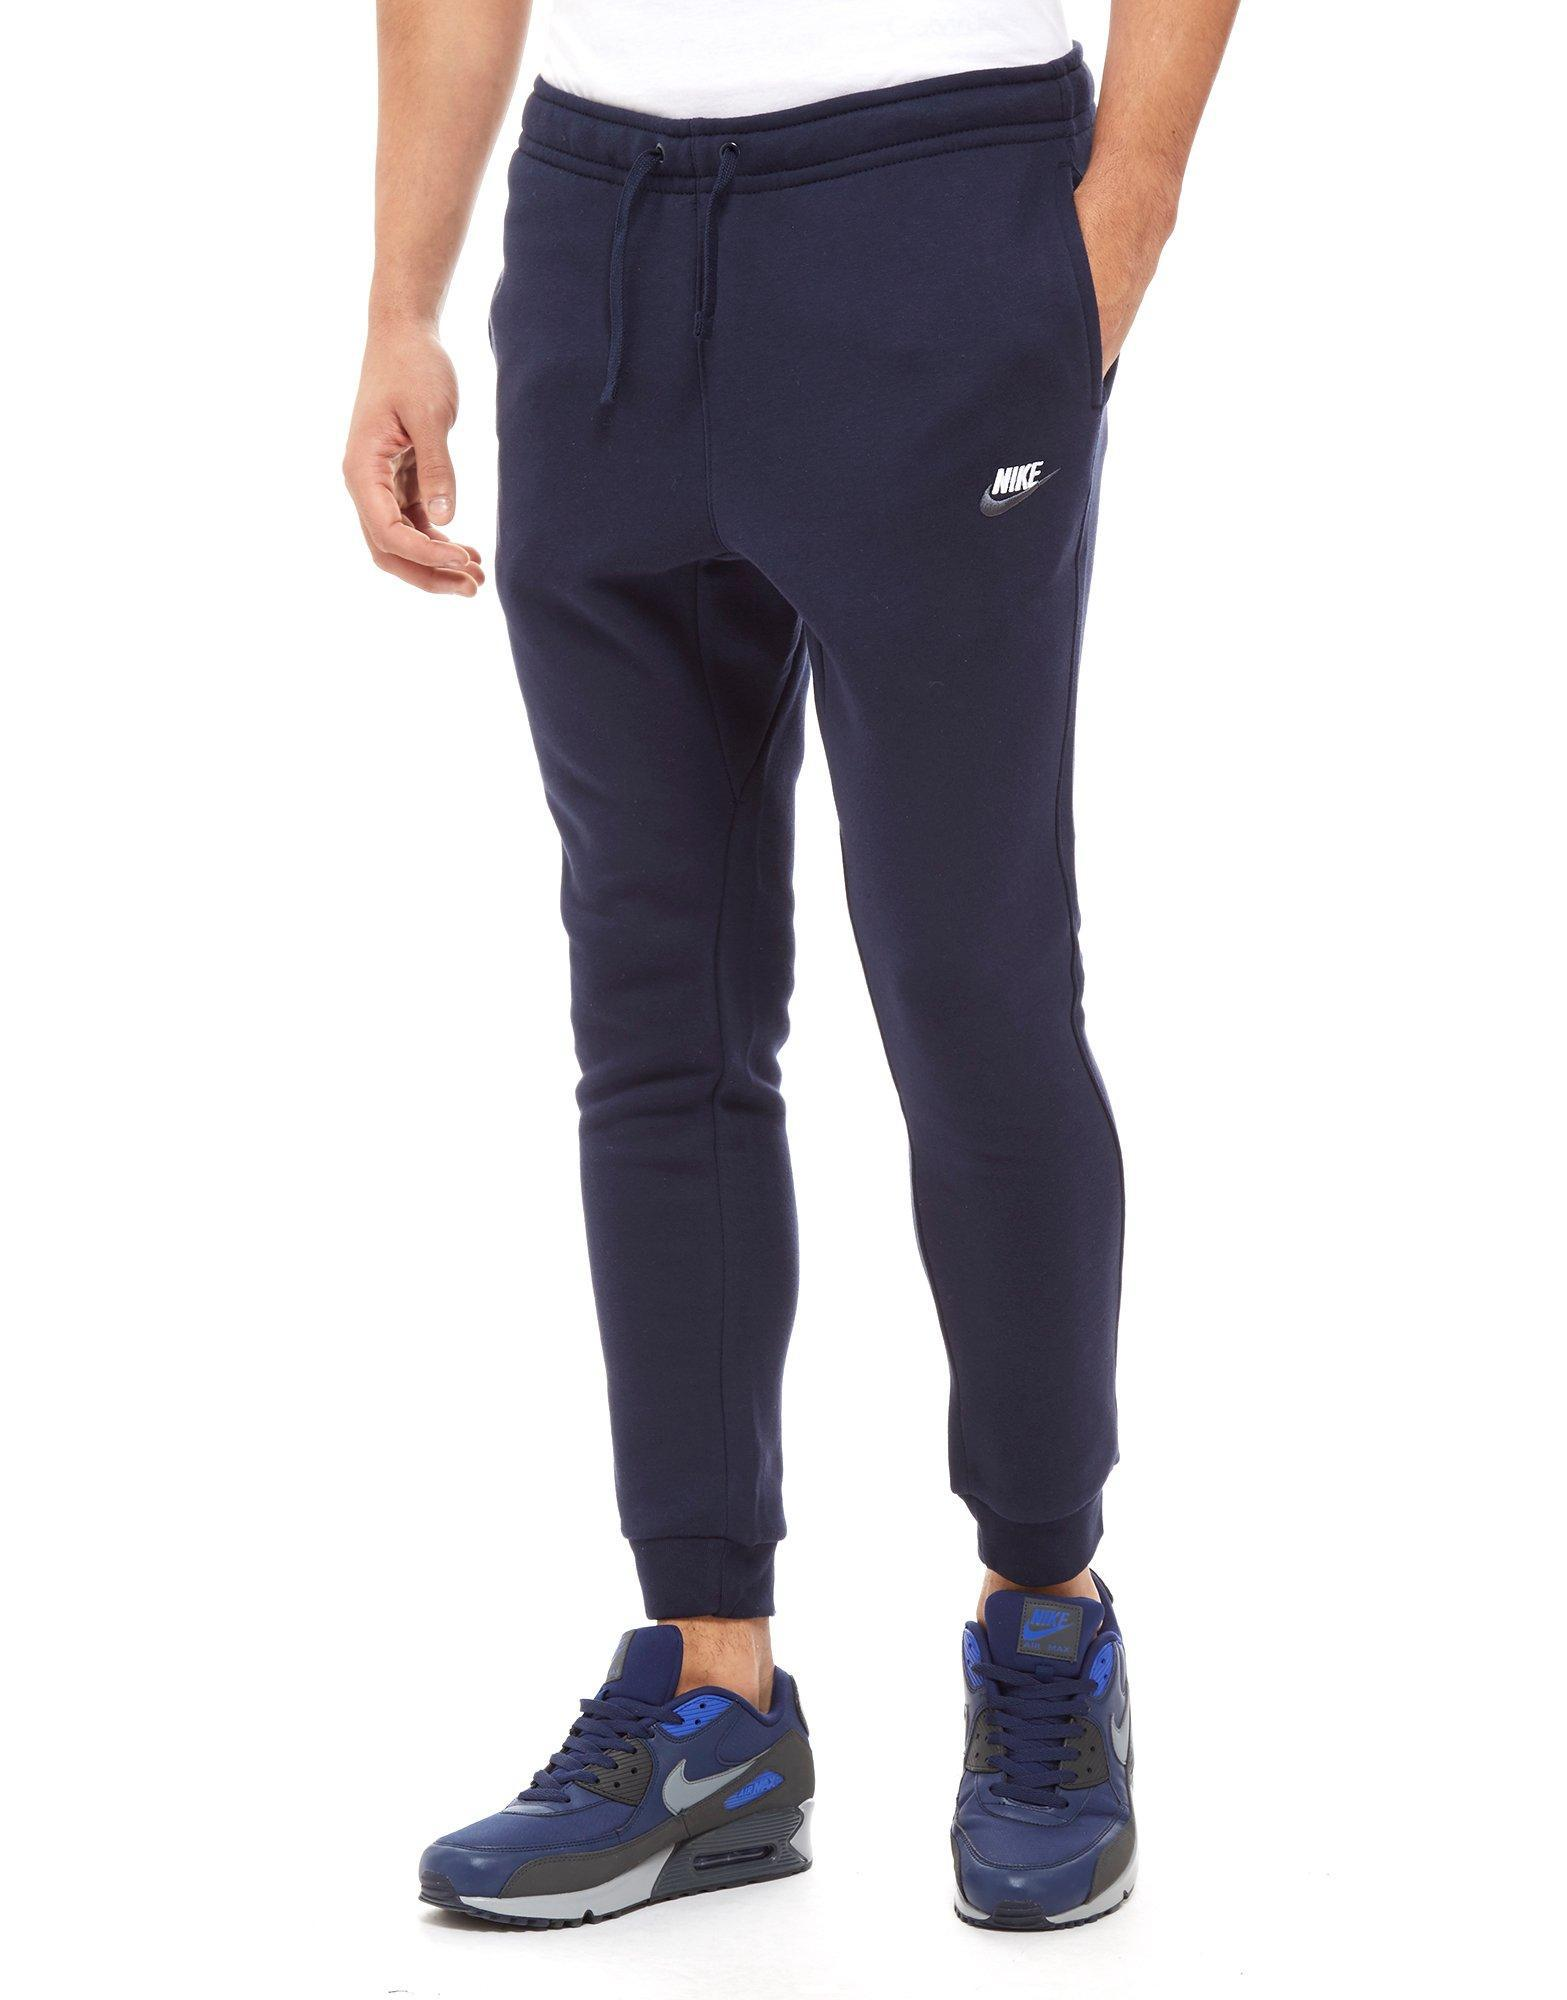 nike foundation fleece track pants grey